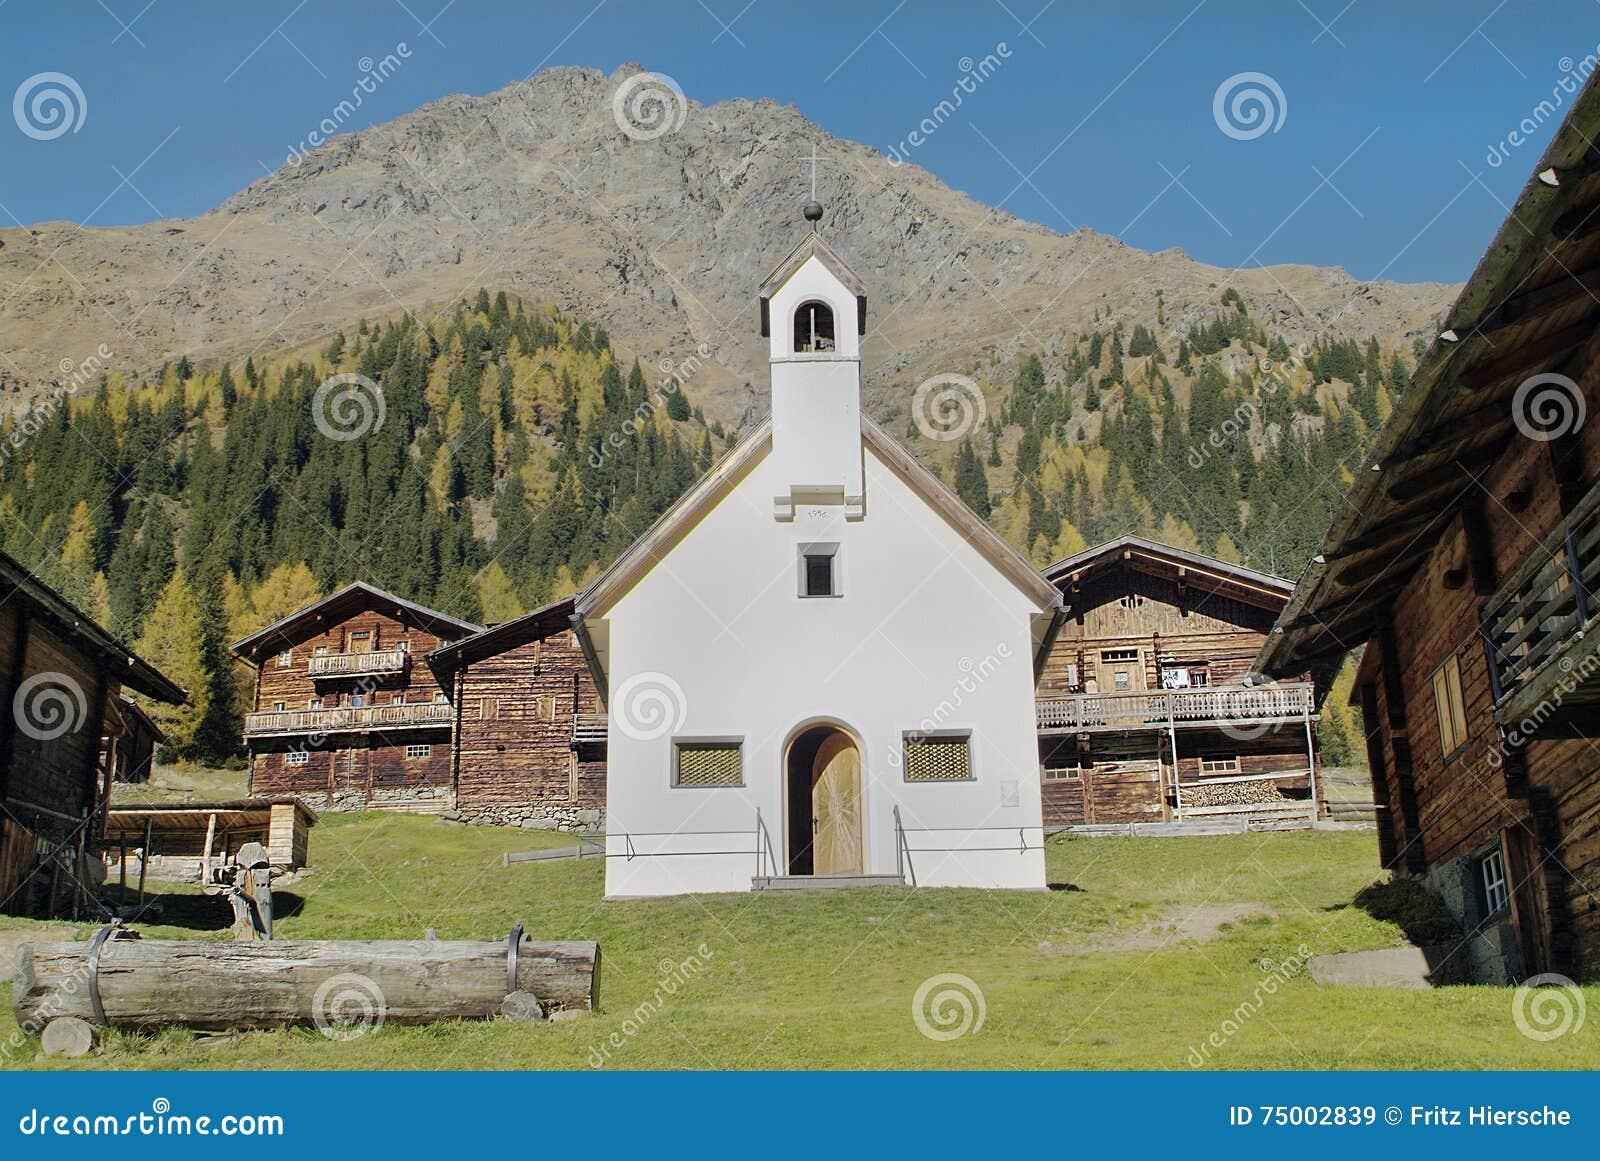 Oostenrijk, Osttirol,